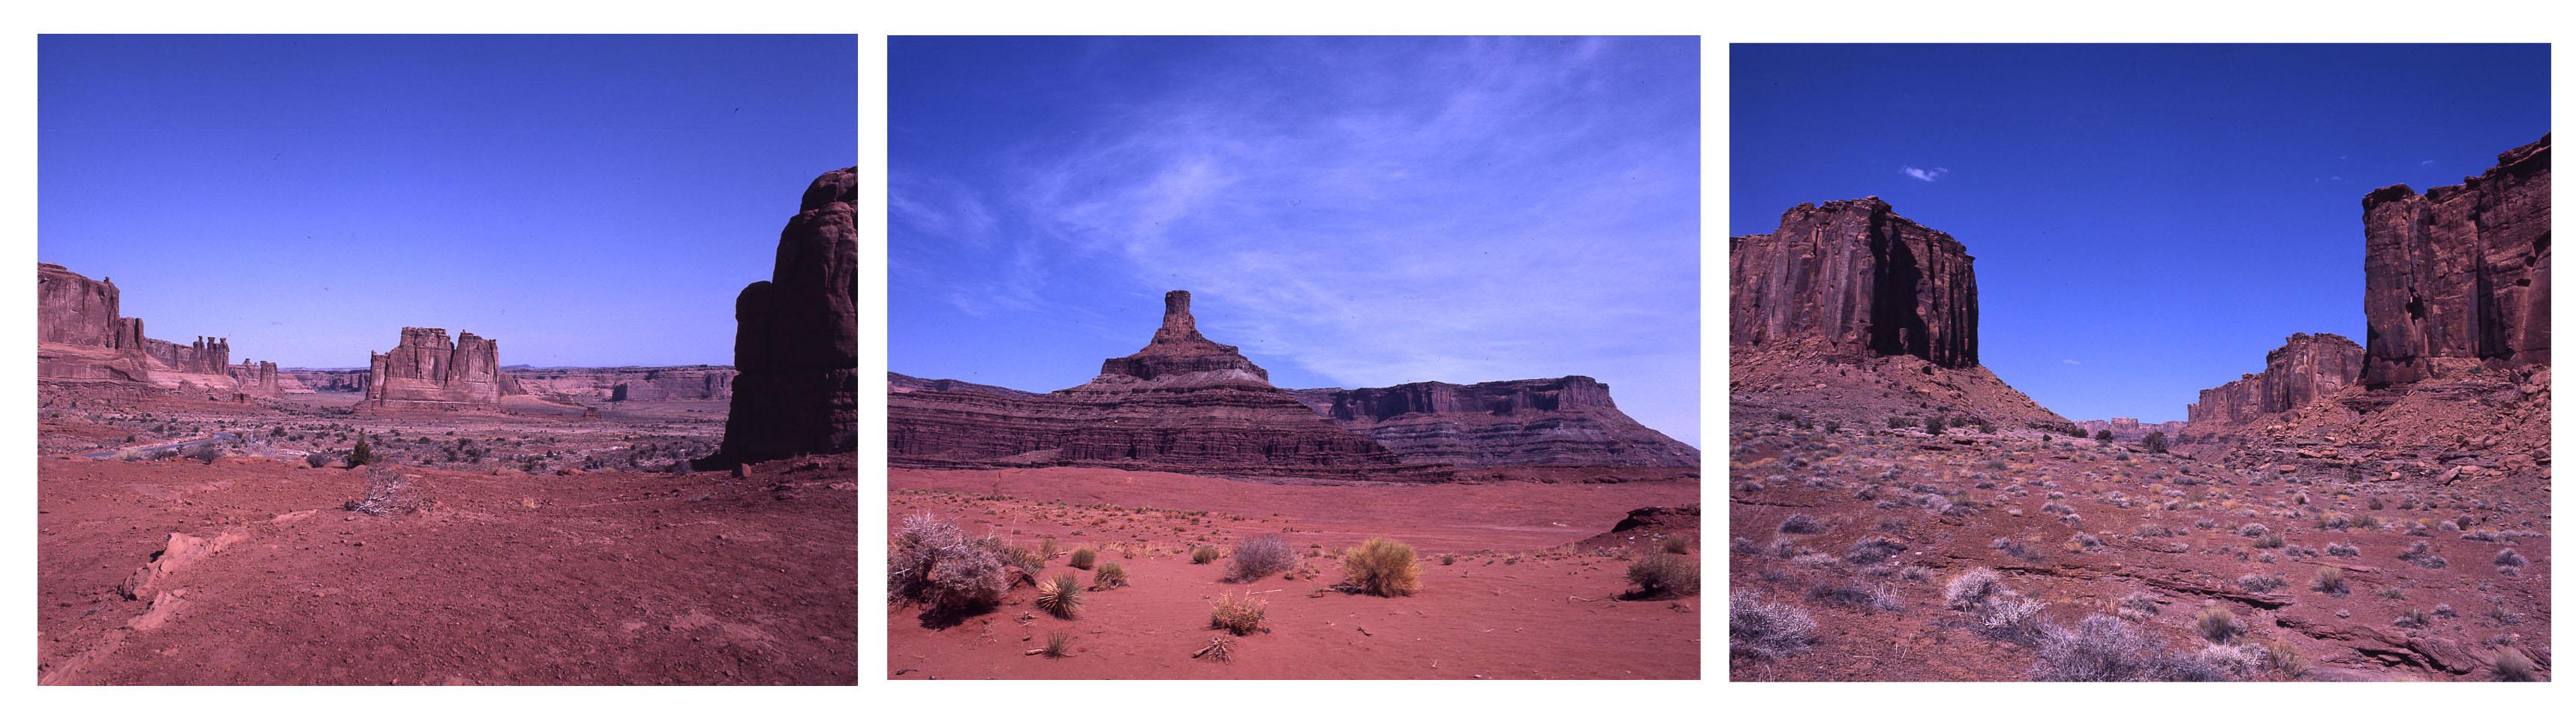 us-ut-Canyonlandx3.jpg